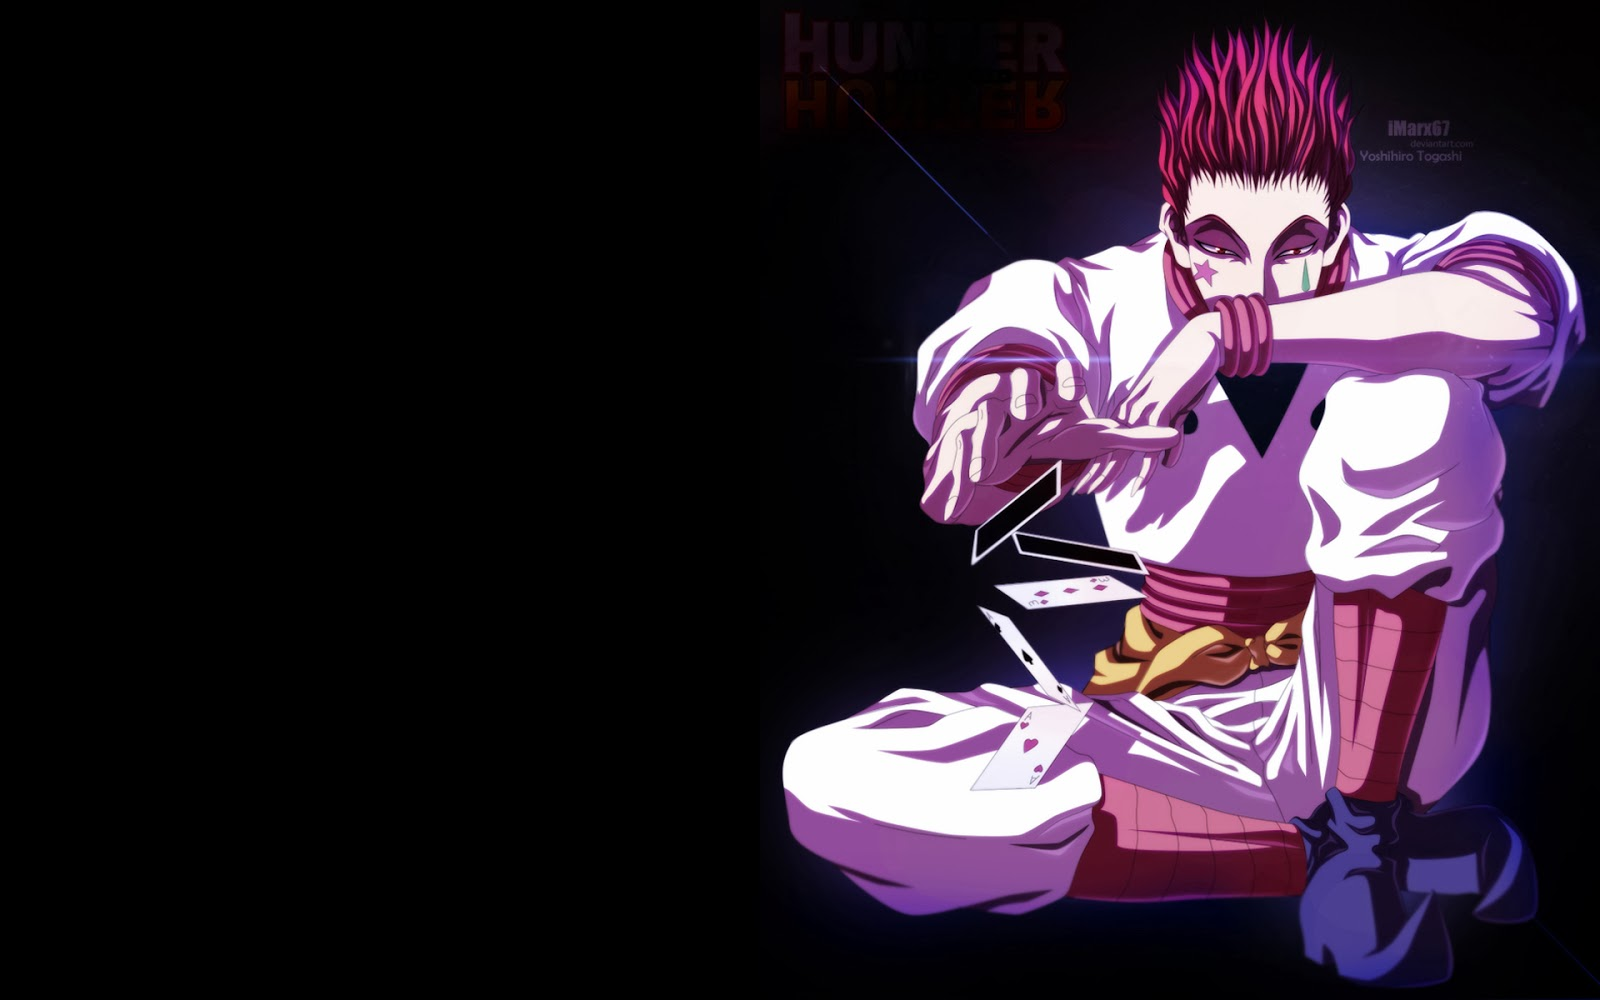 Cards Deviant Art Male Hunter X Hunter 2011 Anime HD Wallpaper n07 1600x1000